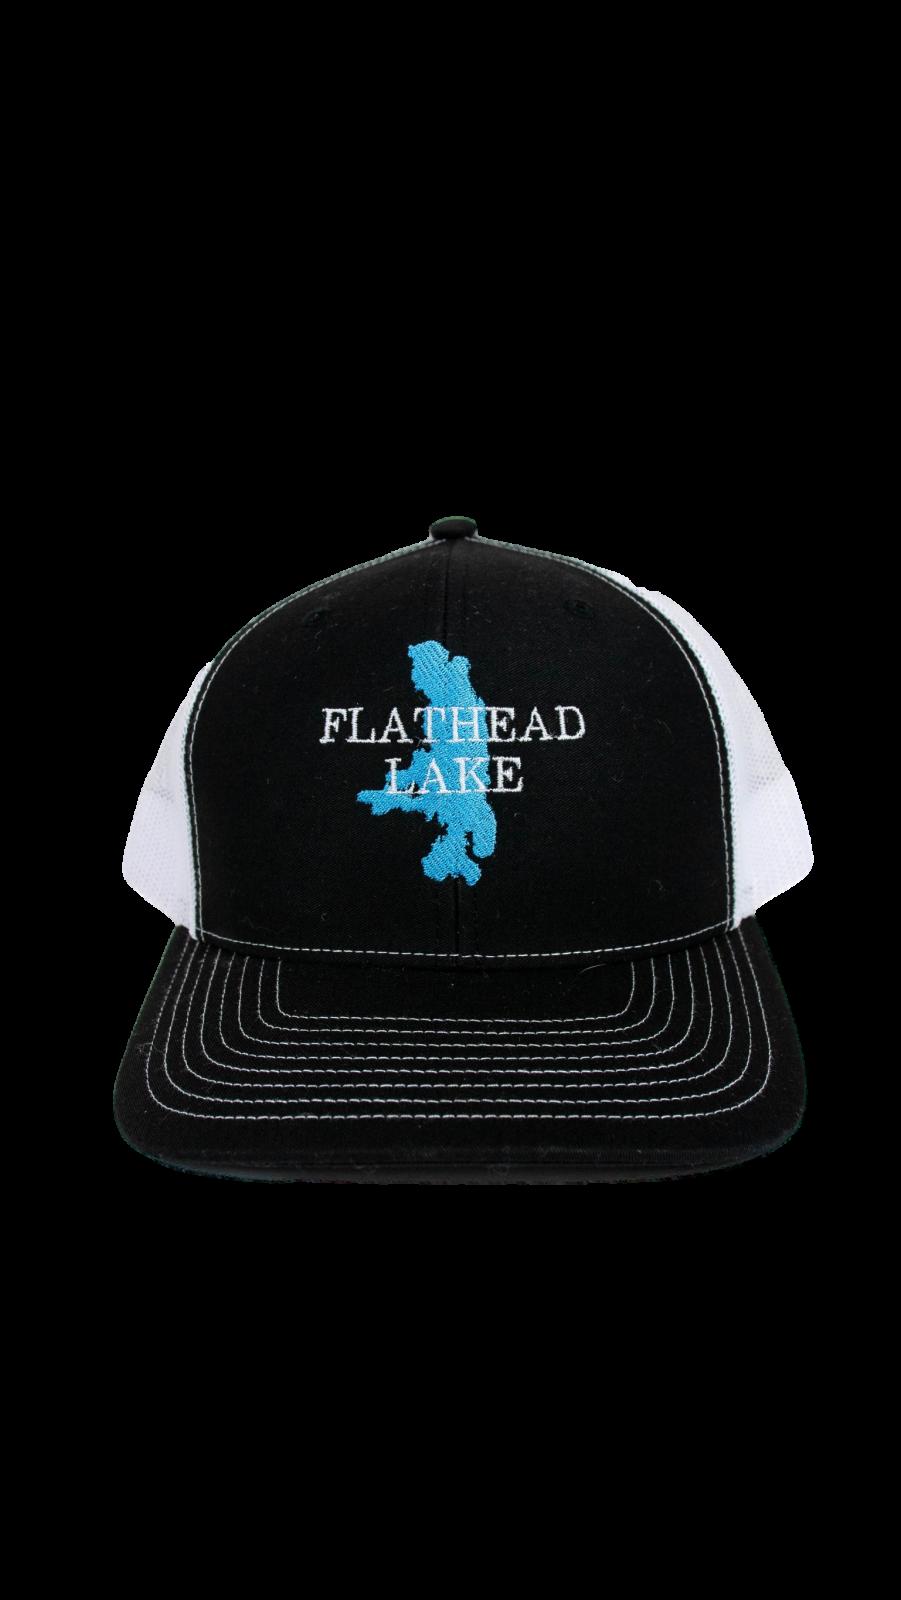 Flathead Lake Black / White Trucker Hat